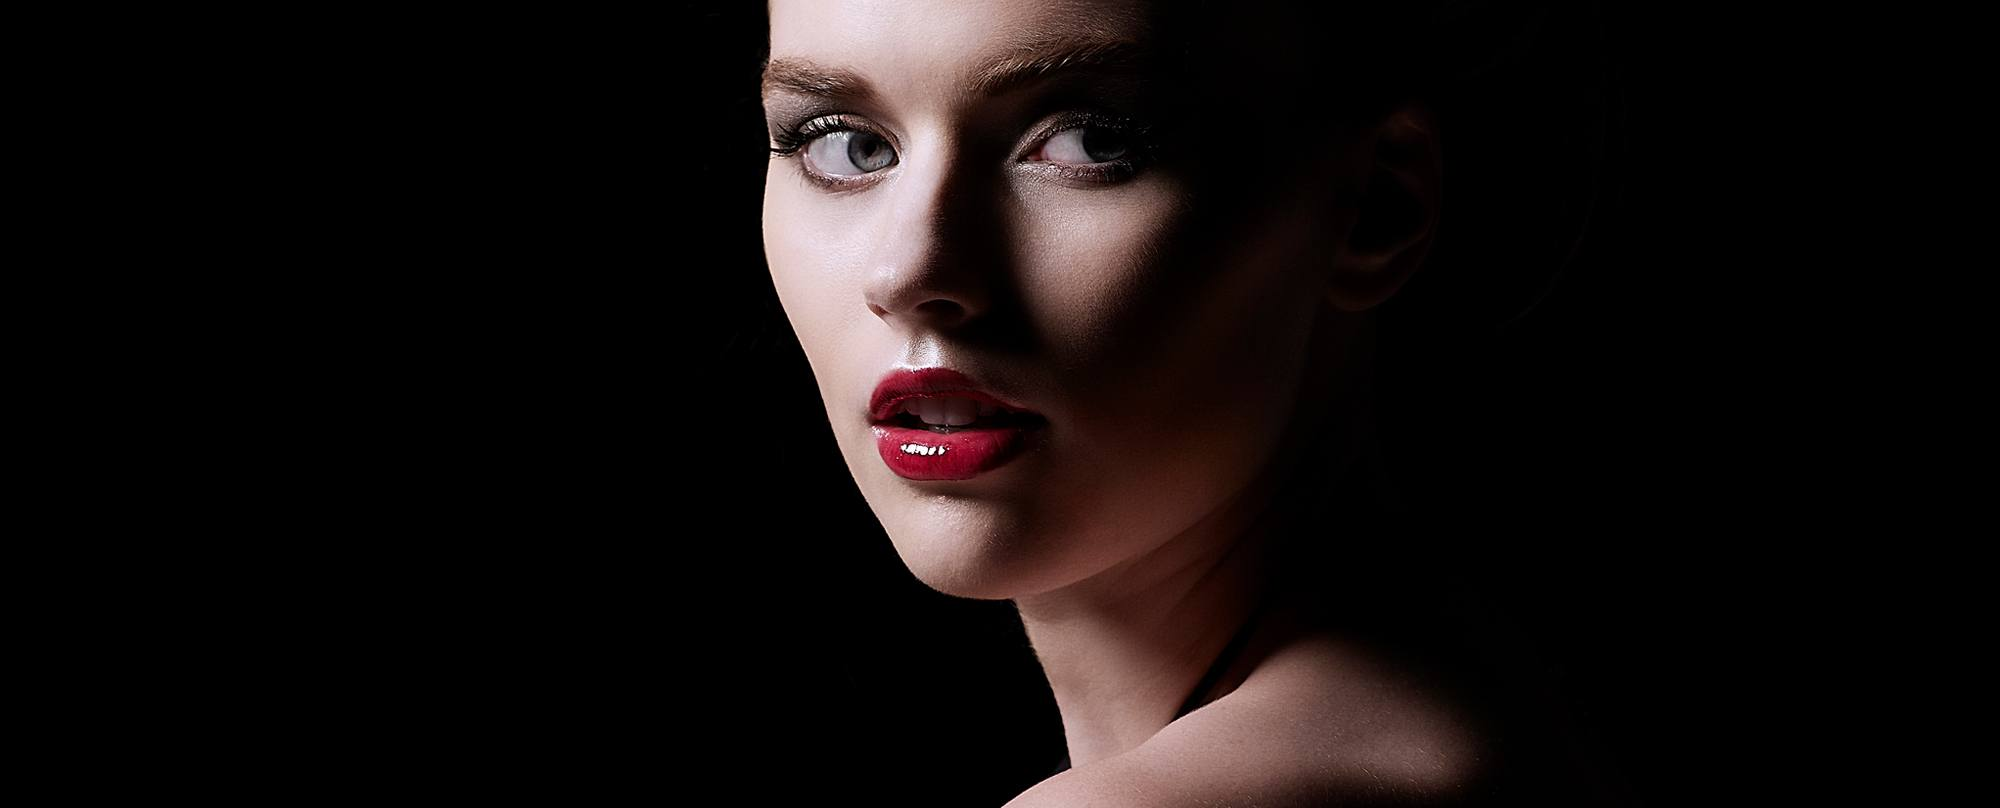 3 Photography Lighting Styles For Stunning Salon Portraits